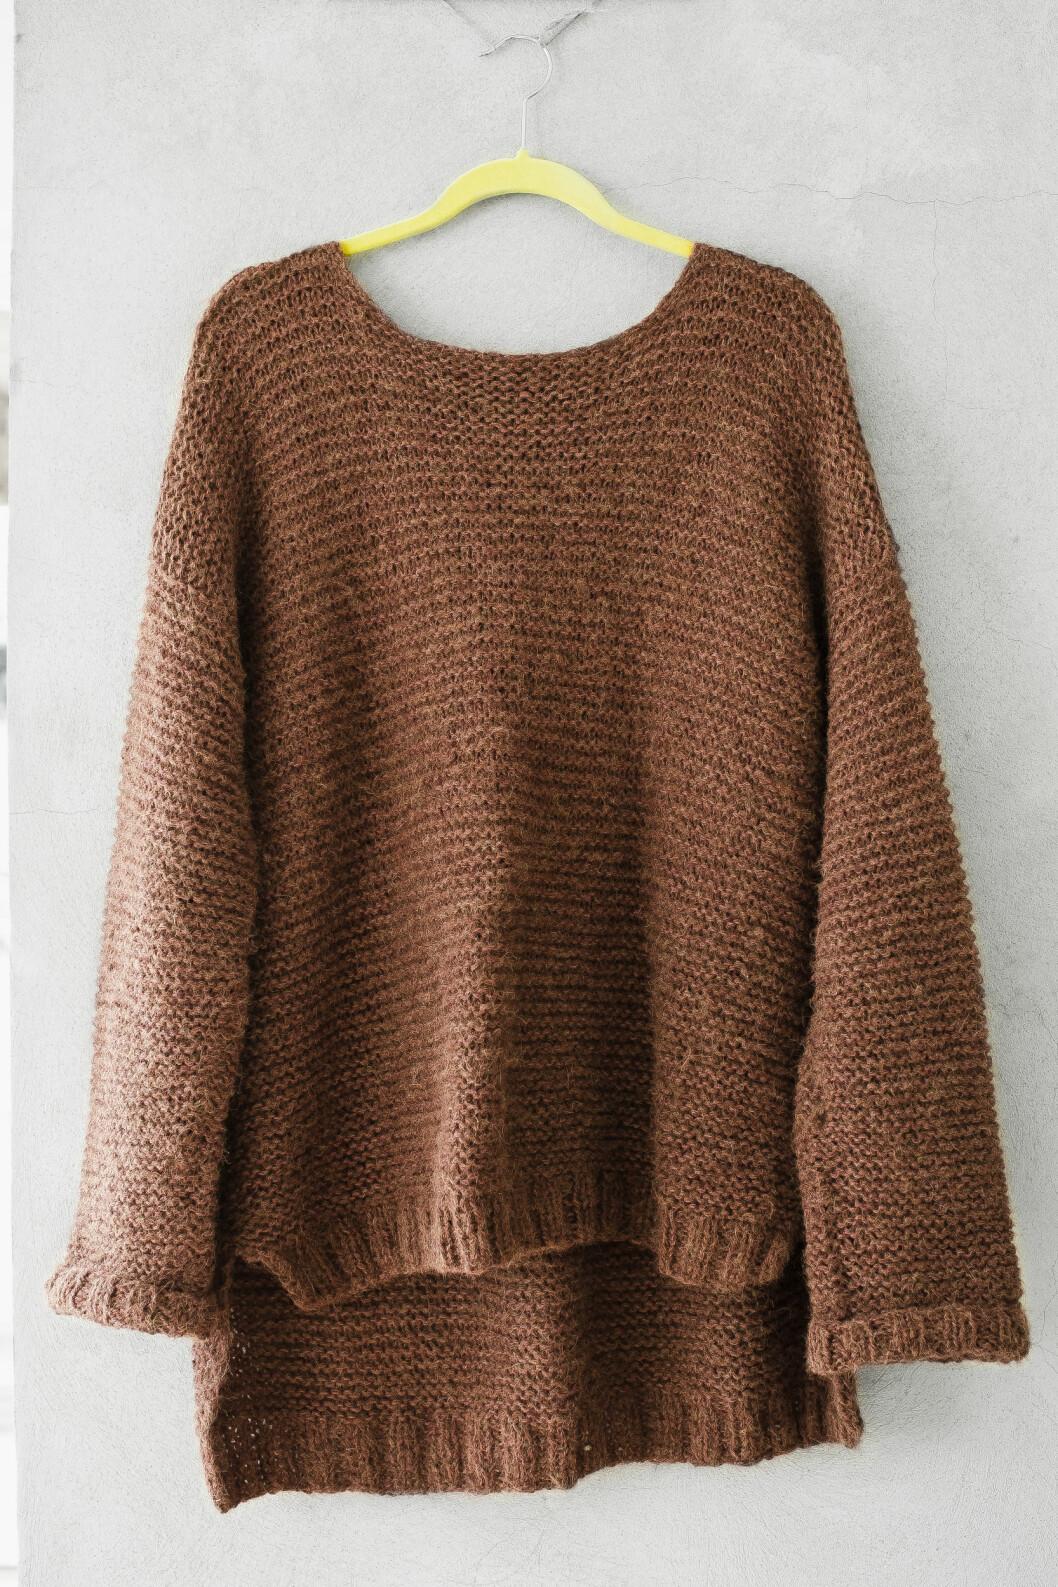 KLASSIKER: Den populære Skappel-genseren er både varm og praktisk.  Foto: Astrid Waller